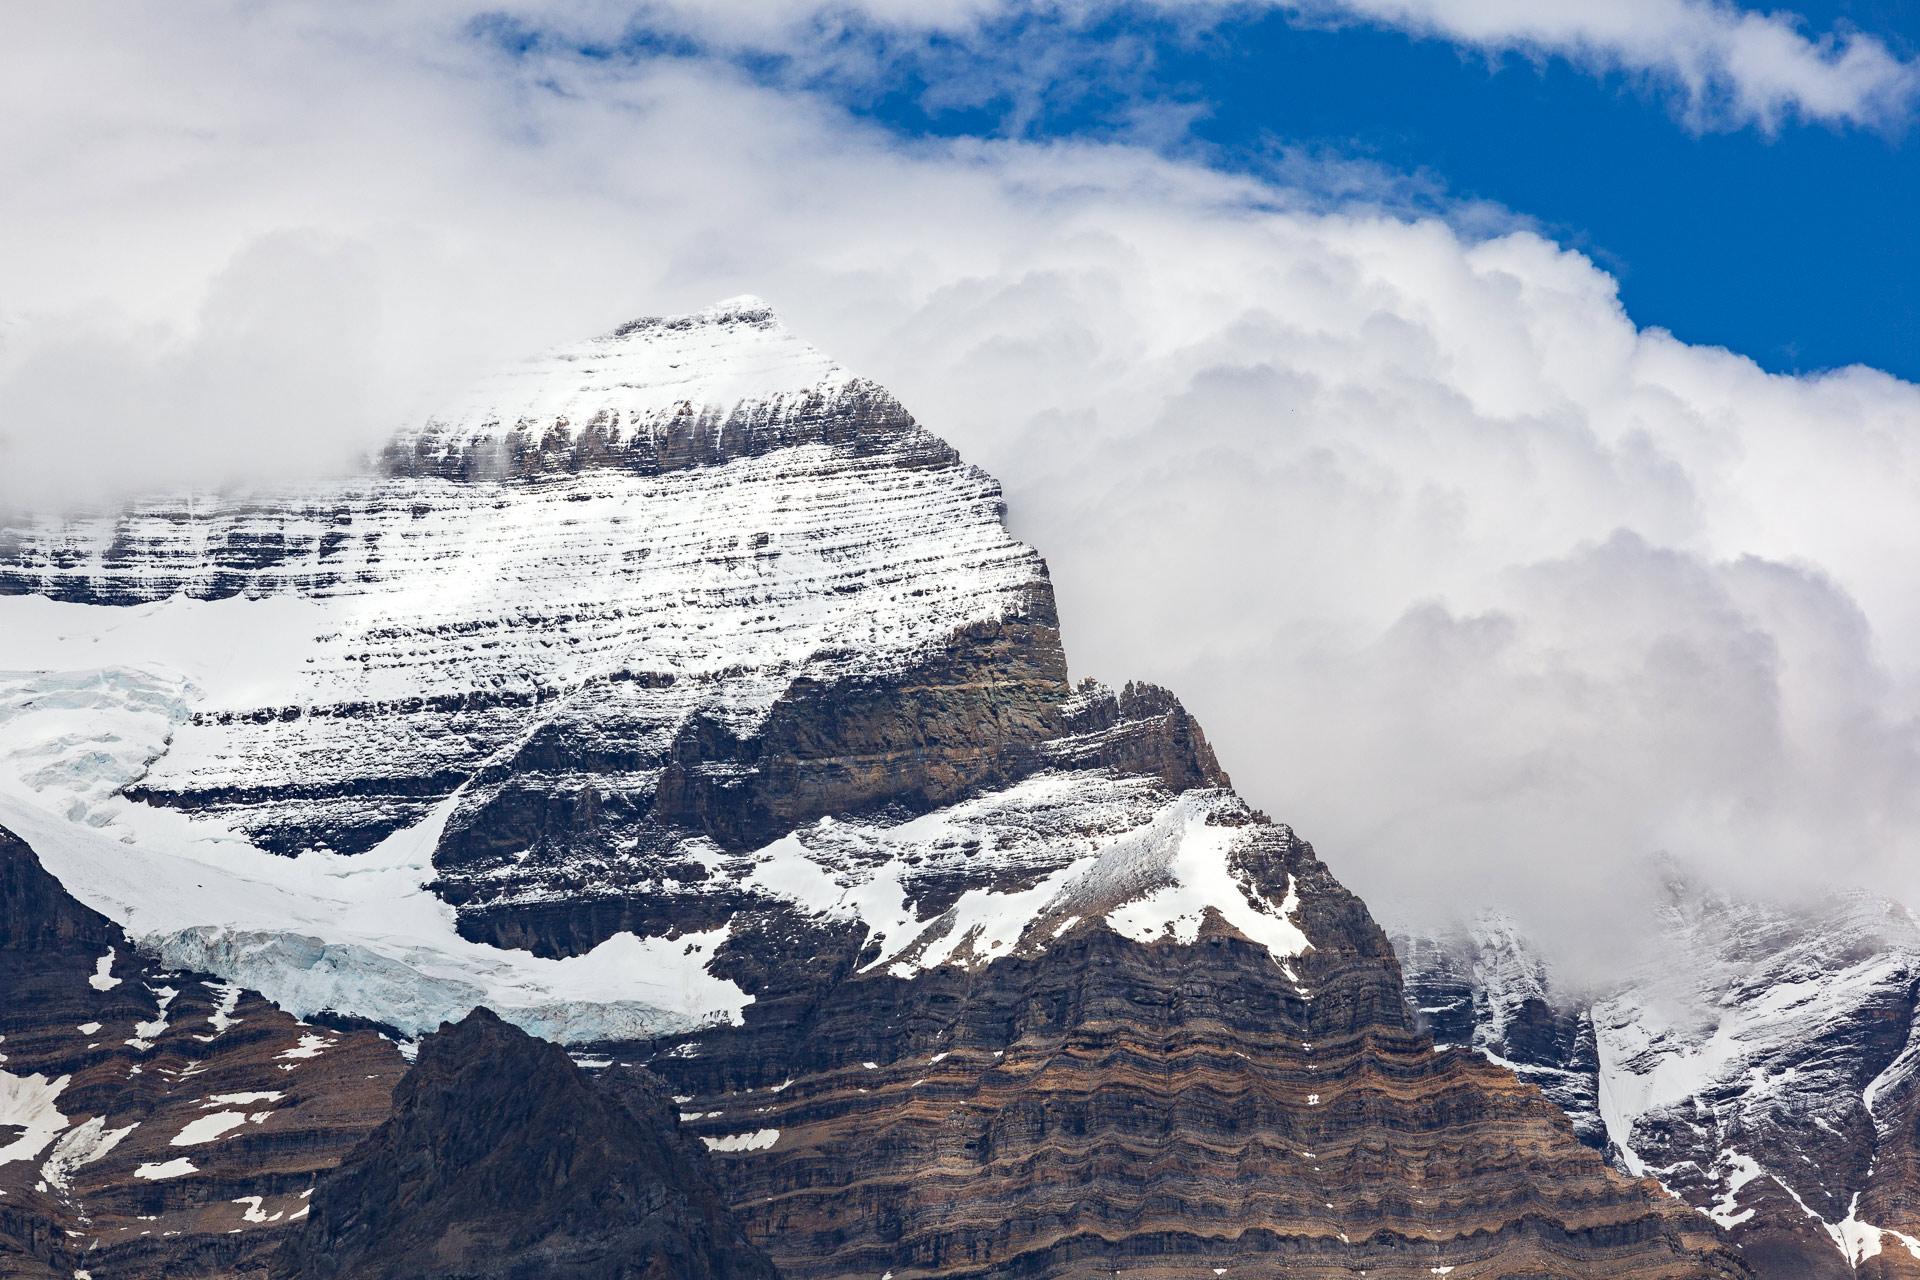 Mont Robson Colombie-Britannique Canada